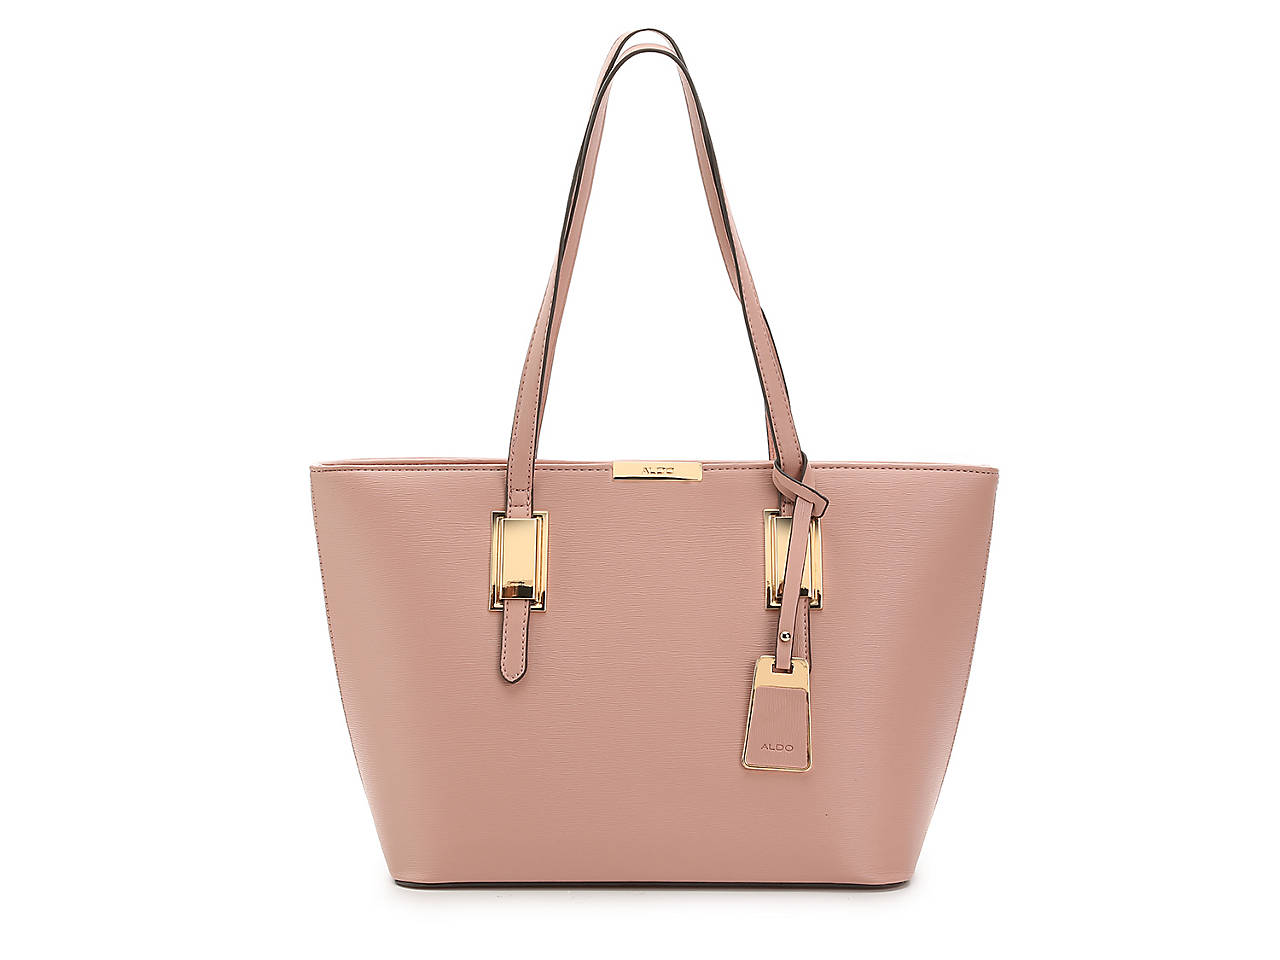 Aldo Shoes Sale Handbags